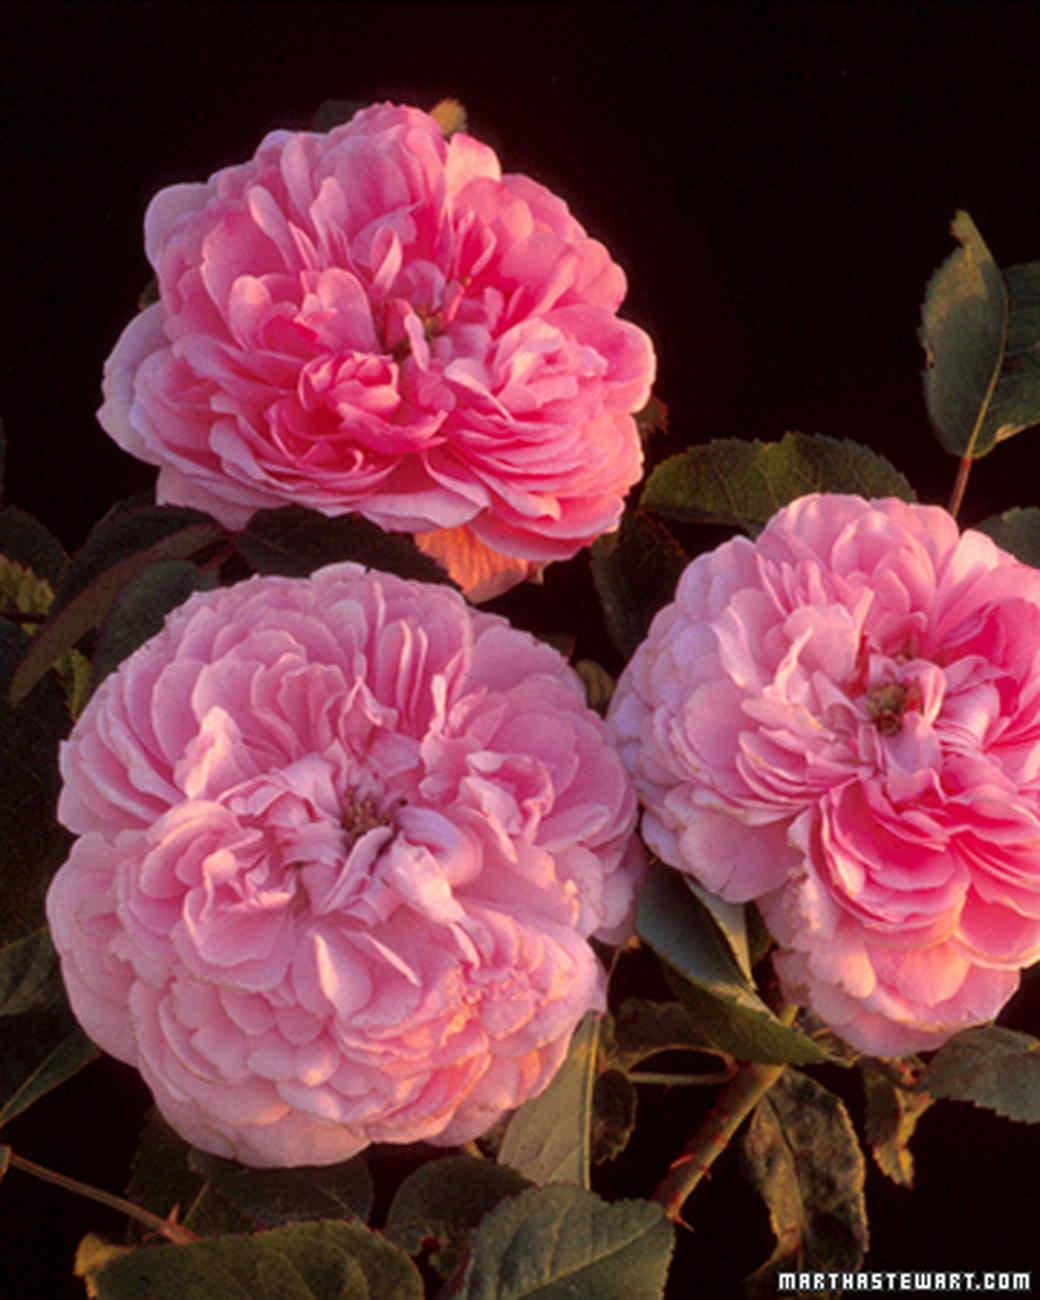 rosa jacques cartier - Fragrant Roses